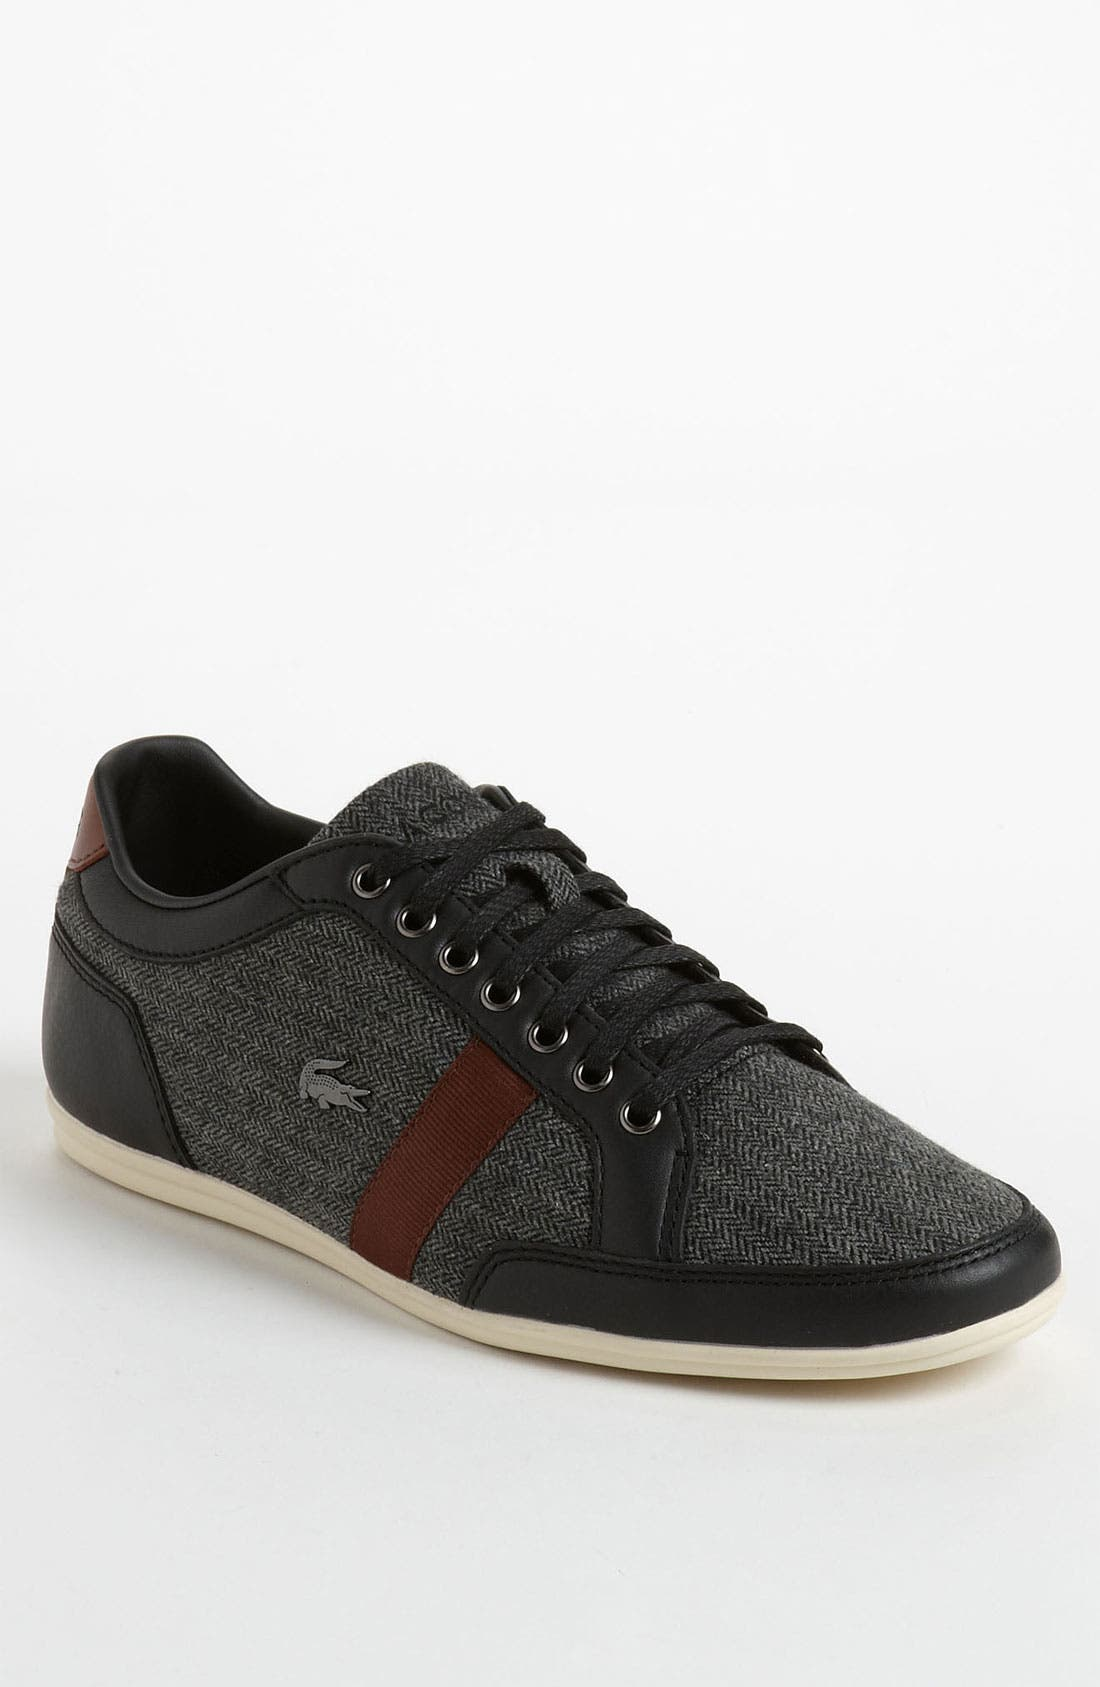 Main Image - Lacoste 'Alisos 7' Sneaker